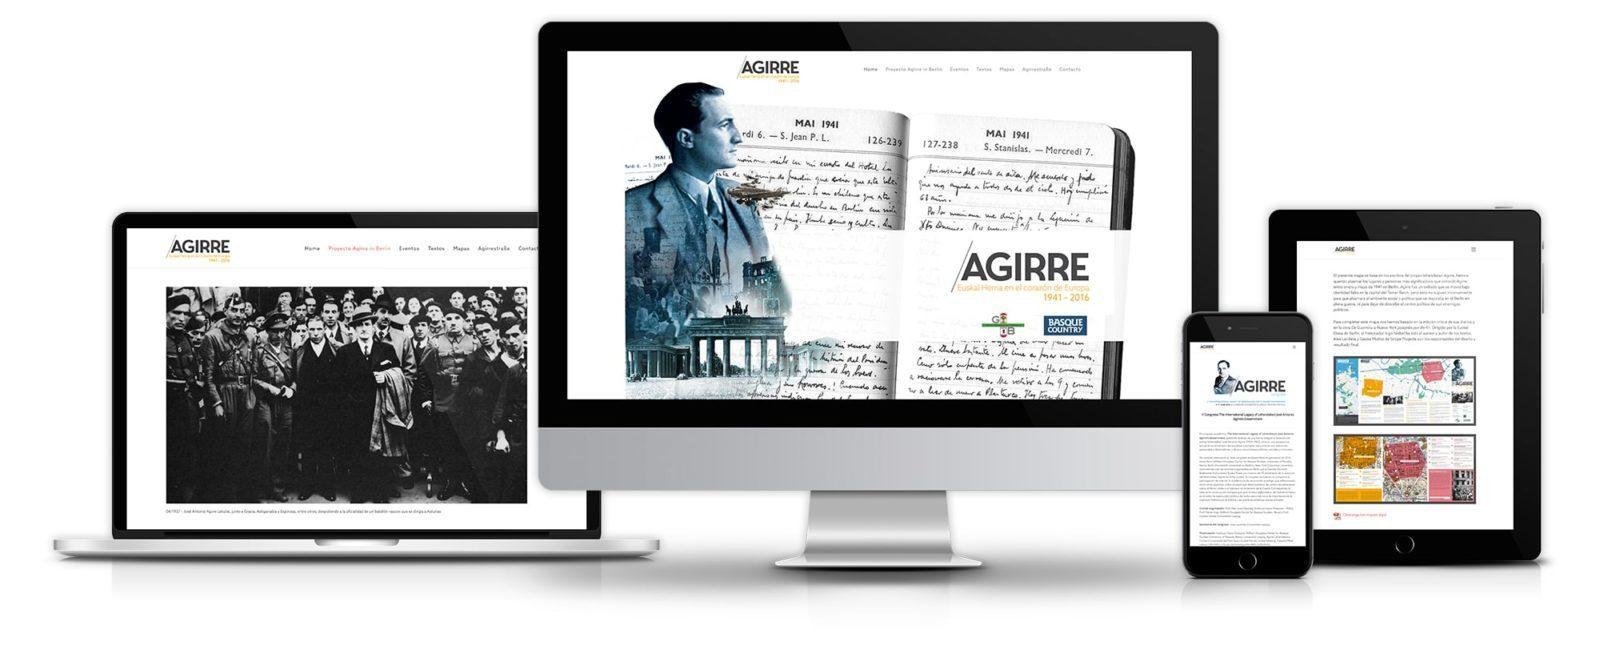 Sirope-Proyectos-lehendakari-agirre-berlin-web-branding-agencia-creatividad